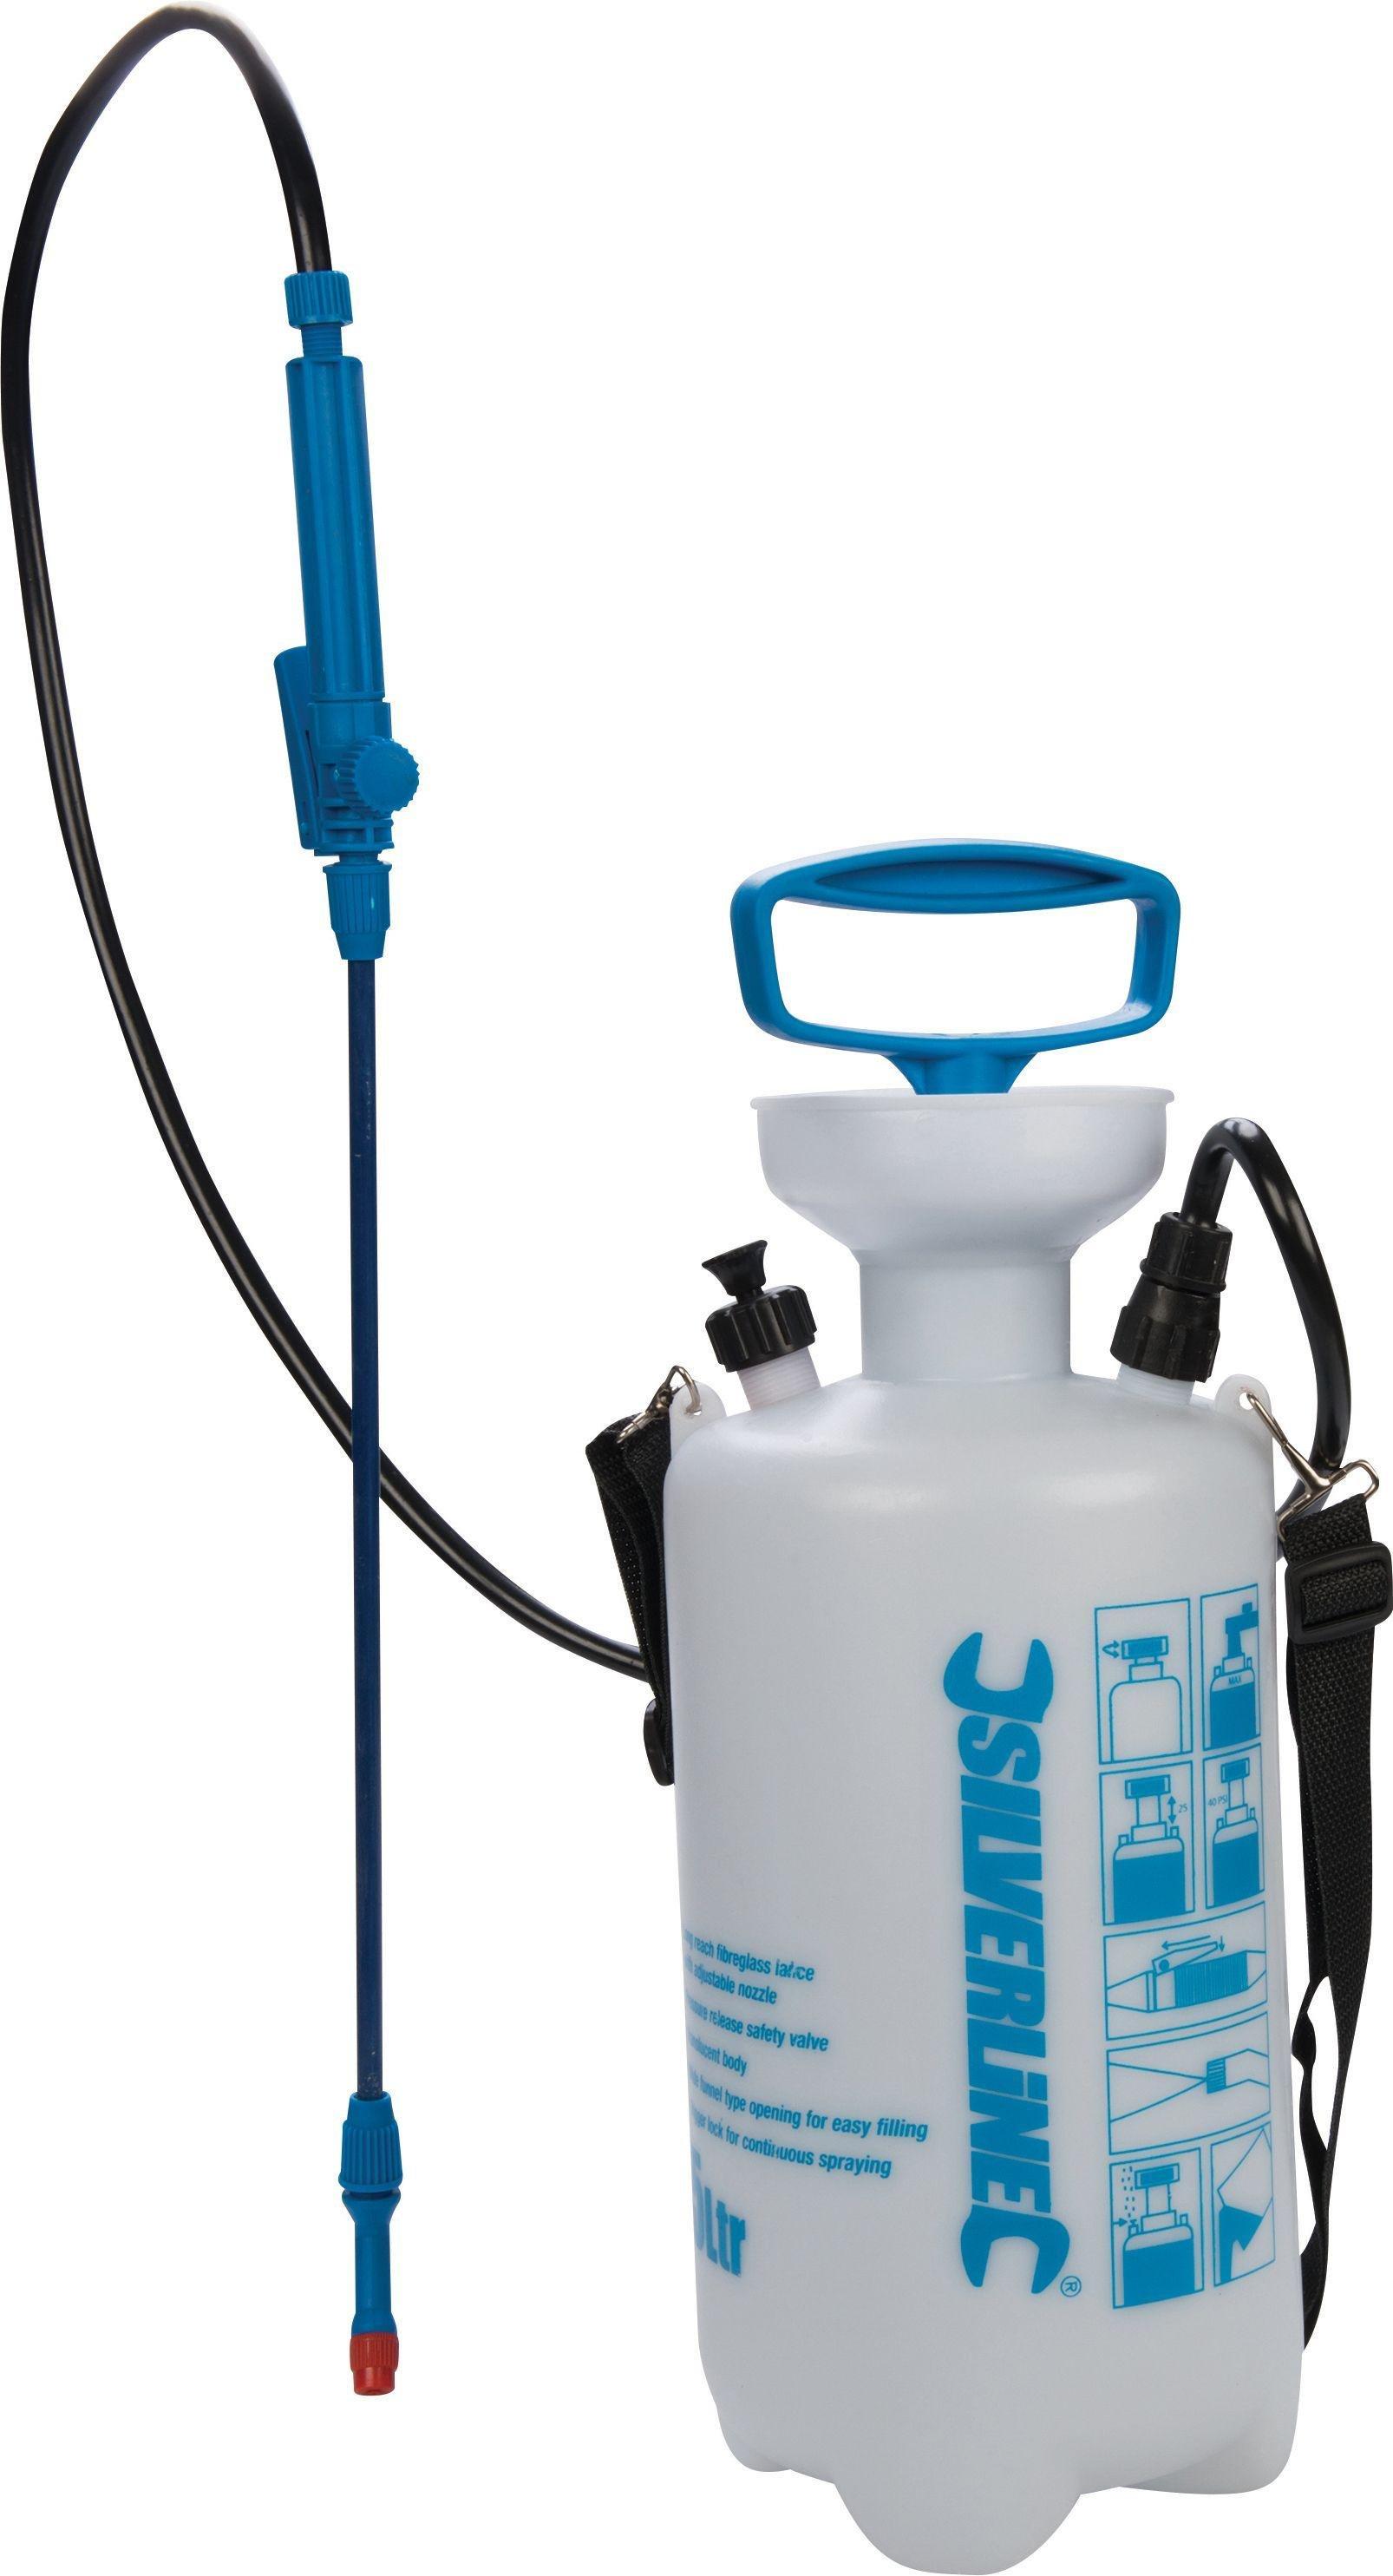 Silverline 675108 Pump-Up Pressure Sprayer - 5 Litre Capacity - £3.90 @ Argos